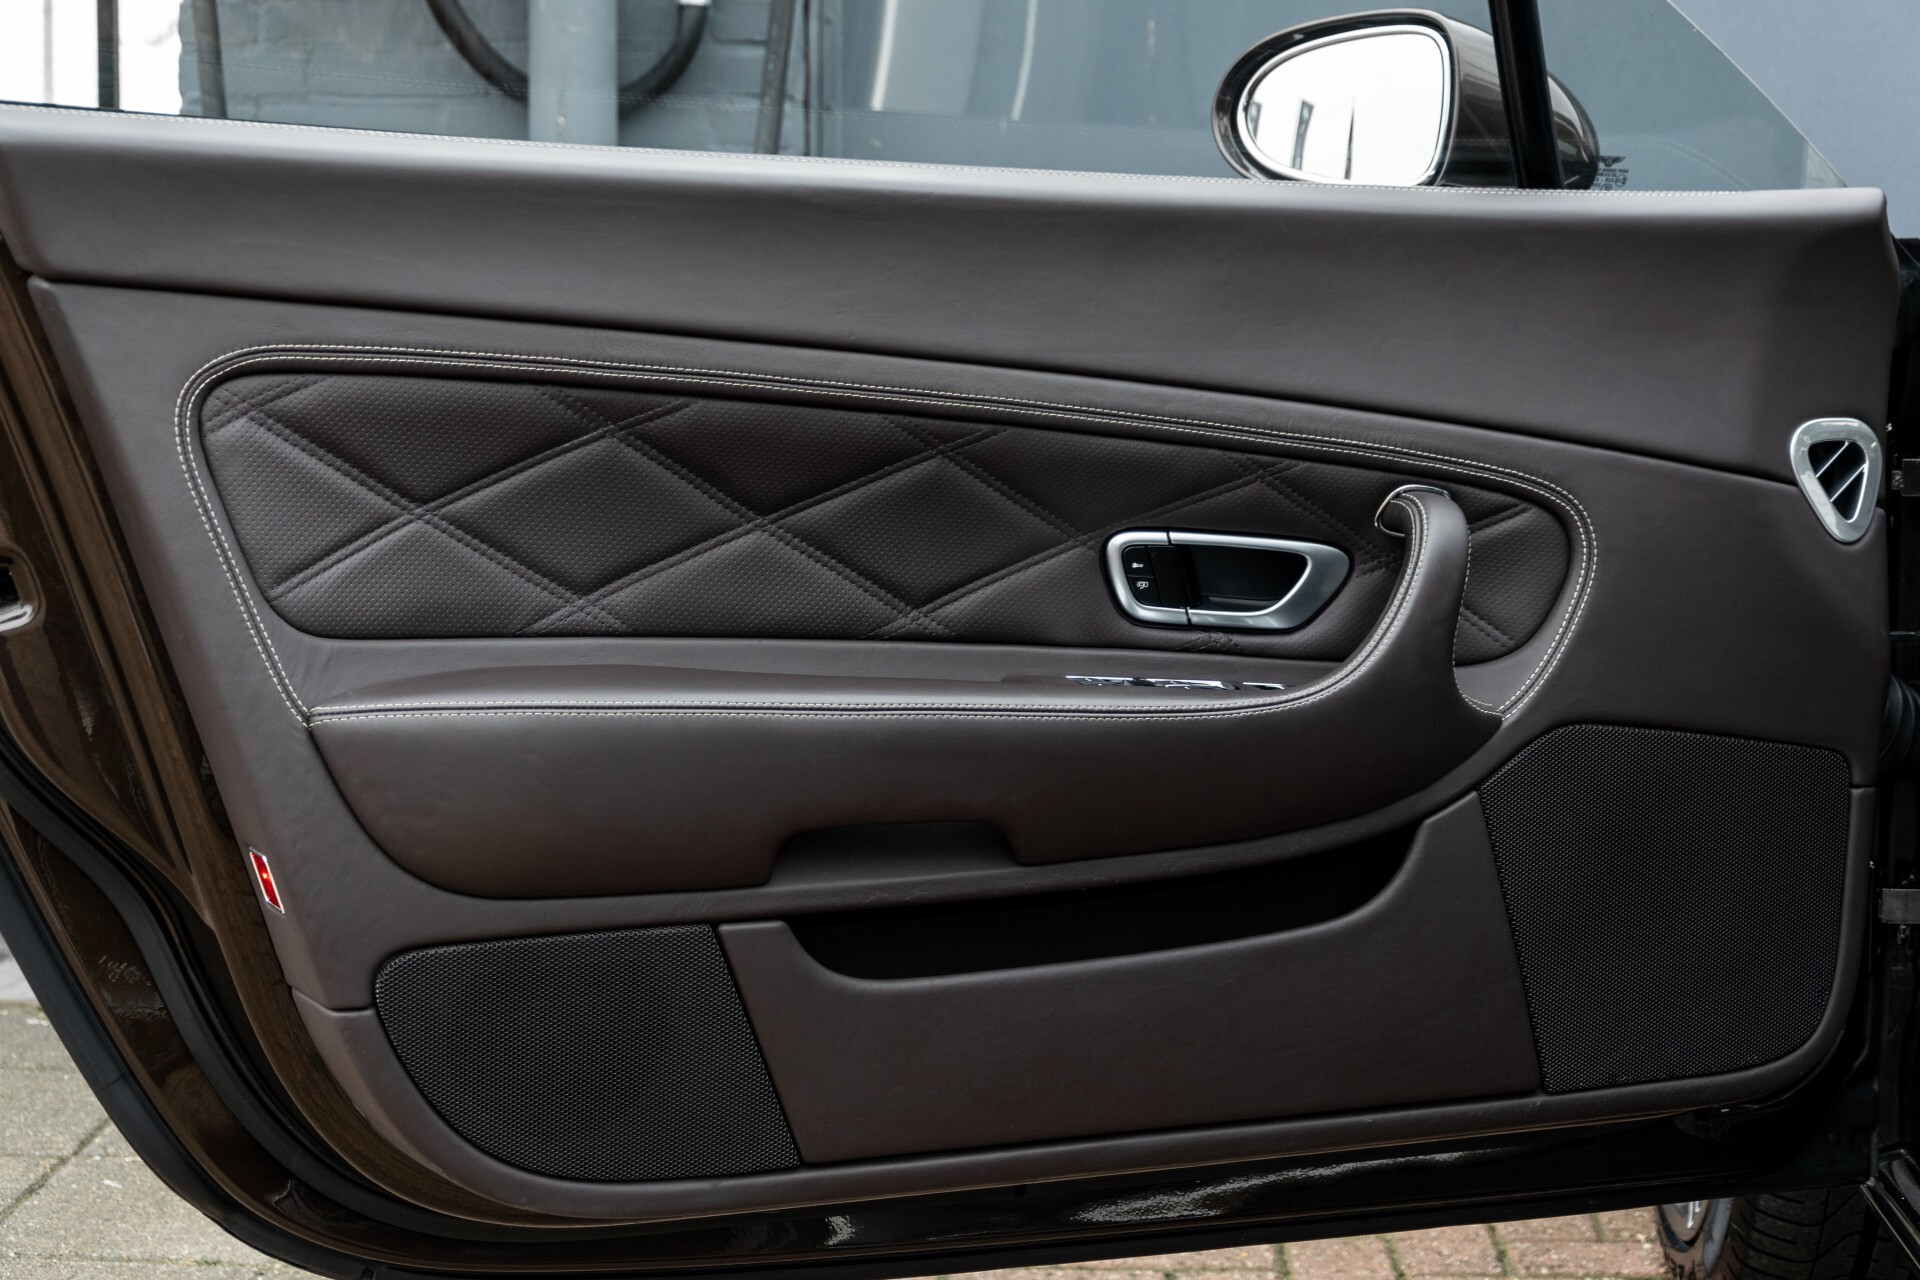 Bentley Continental GT 6.0 W12 GT Speed Ceramic Brakes/Mulliner/Standkachel/Keyless Aut6 Foto 16